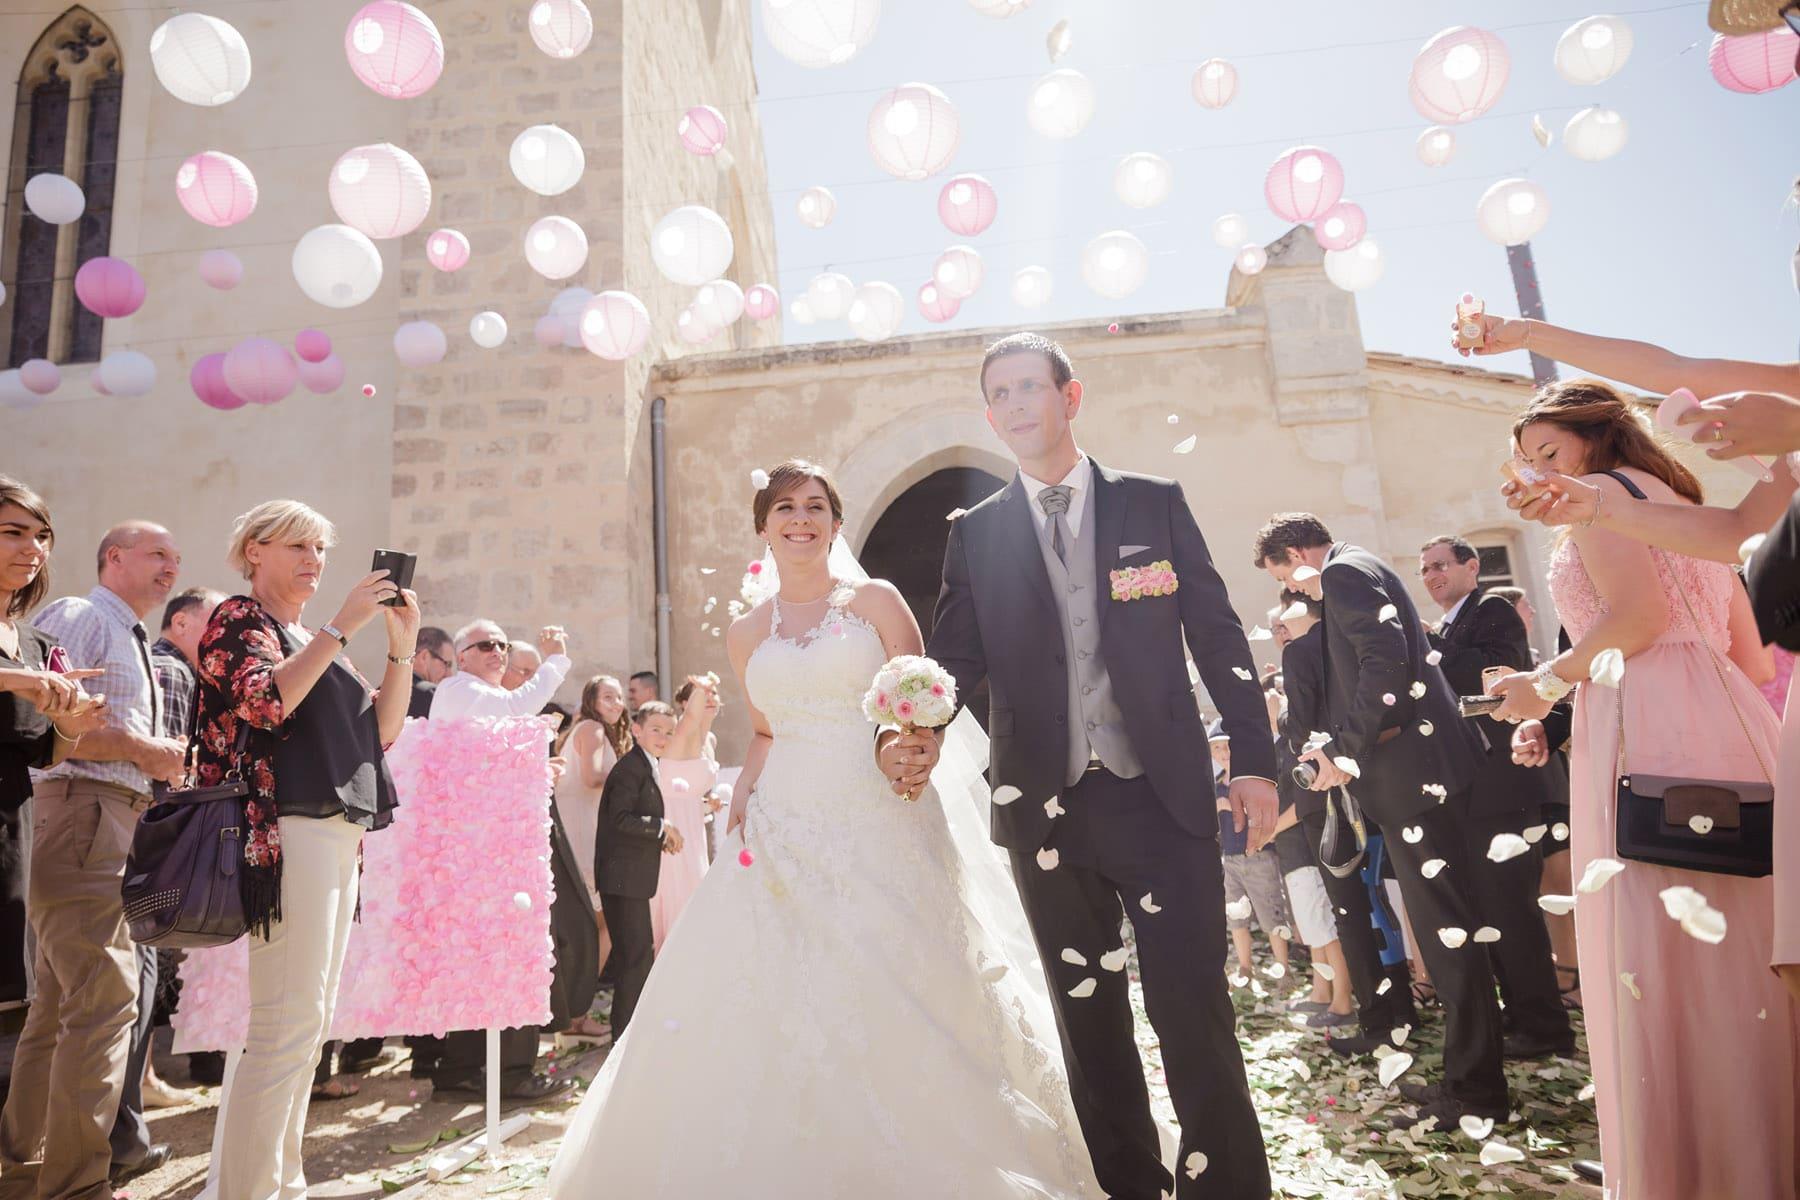 boules chinoises mariage diy photographe mariage bordeaux landes fineart francais sarah miramon blog 19